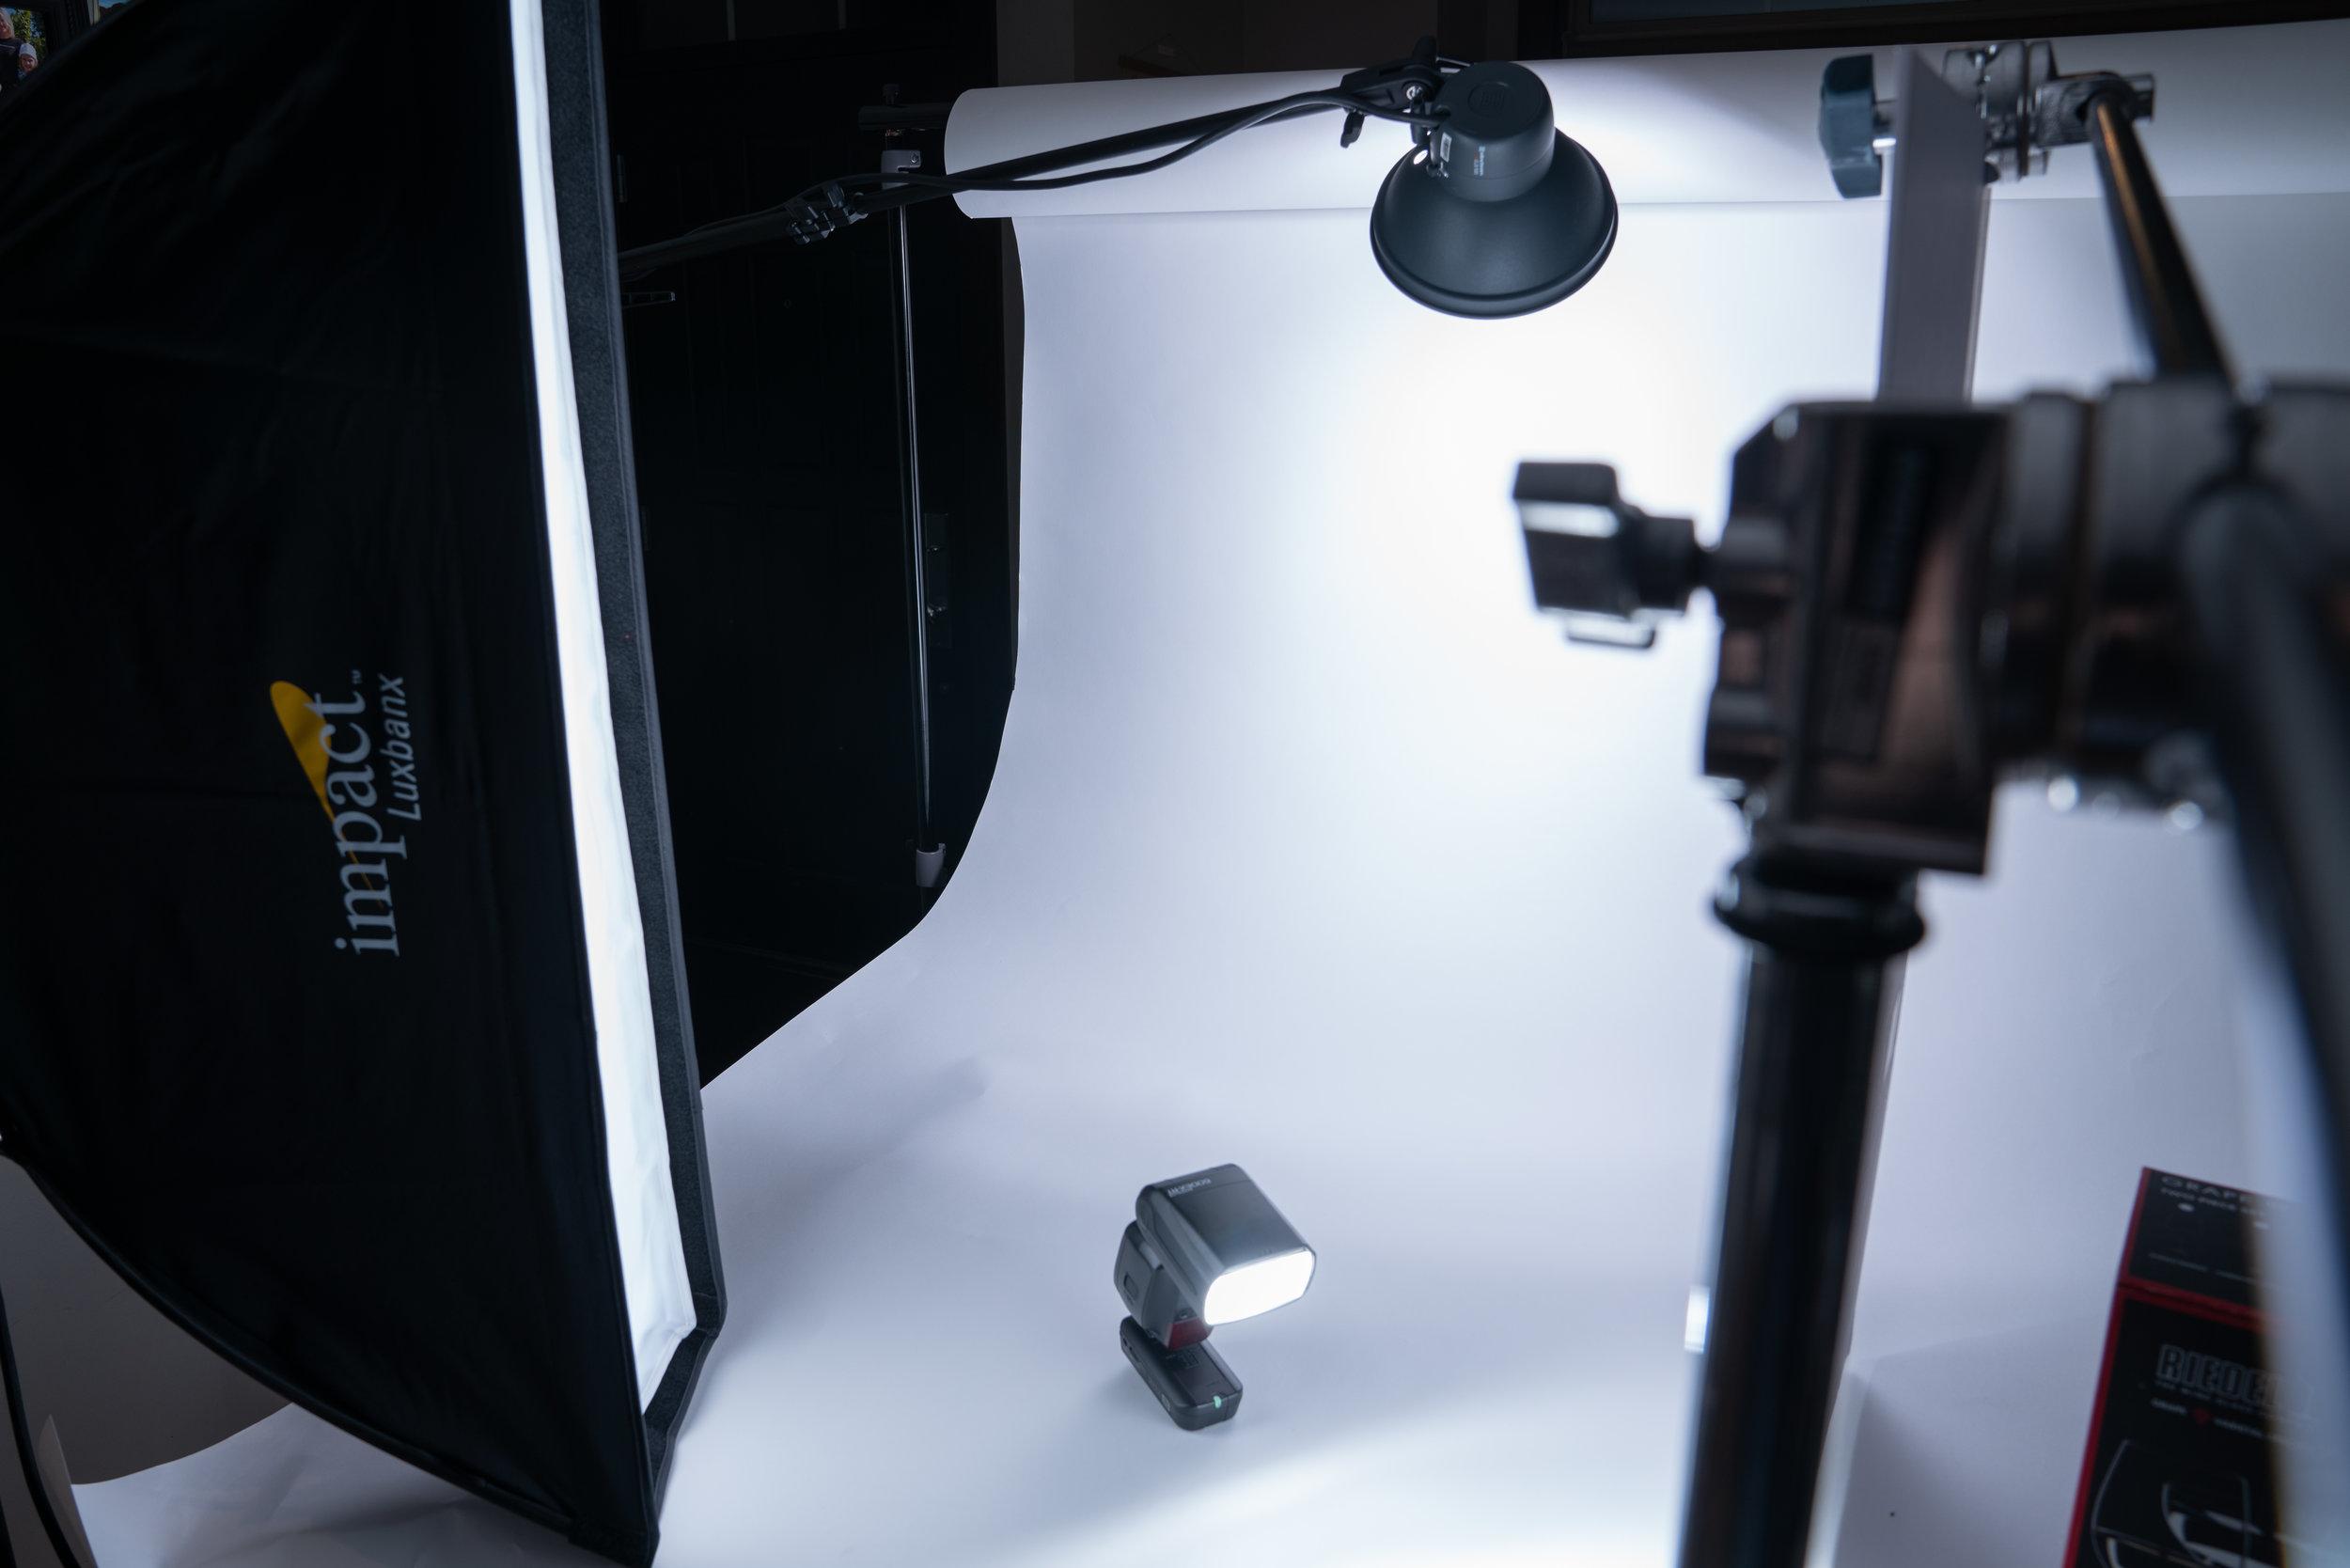 Elinchrom-ELB-500-with-Canon-Speedlight-1.jpg